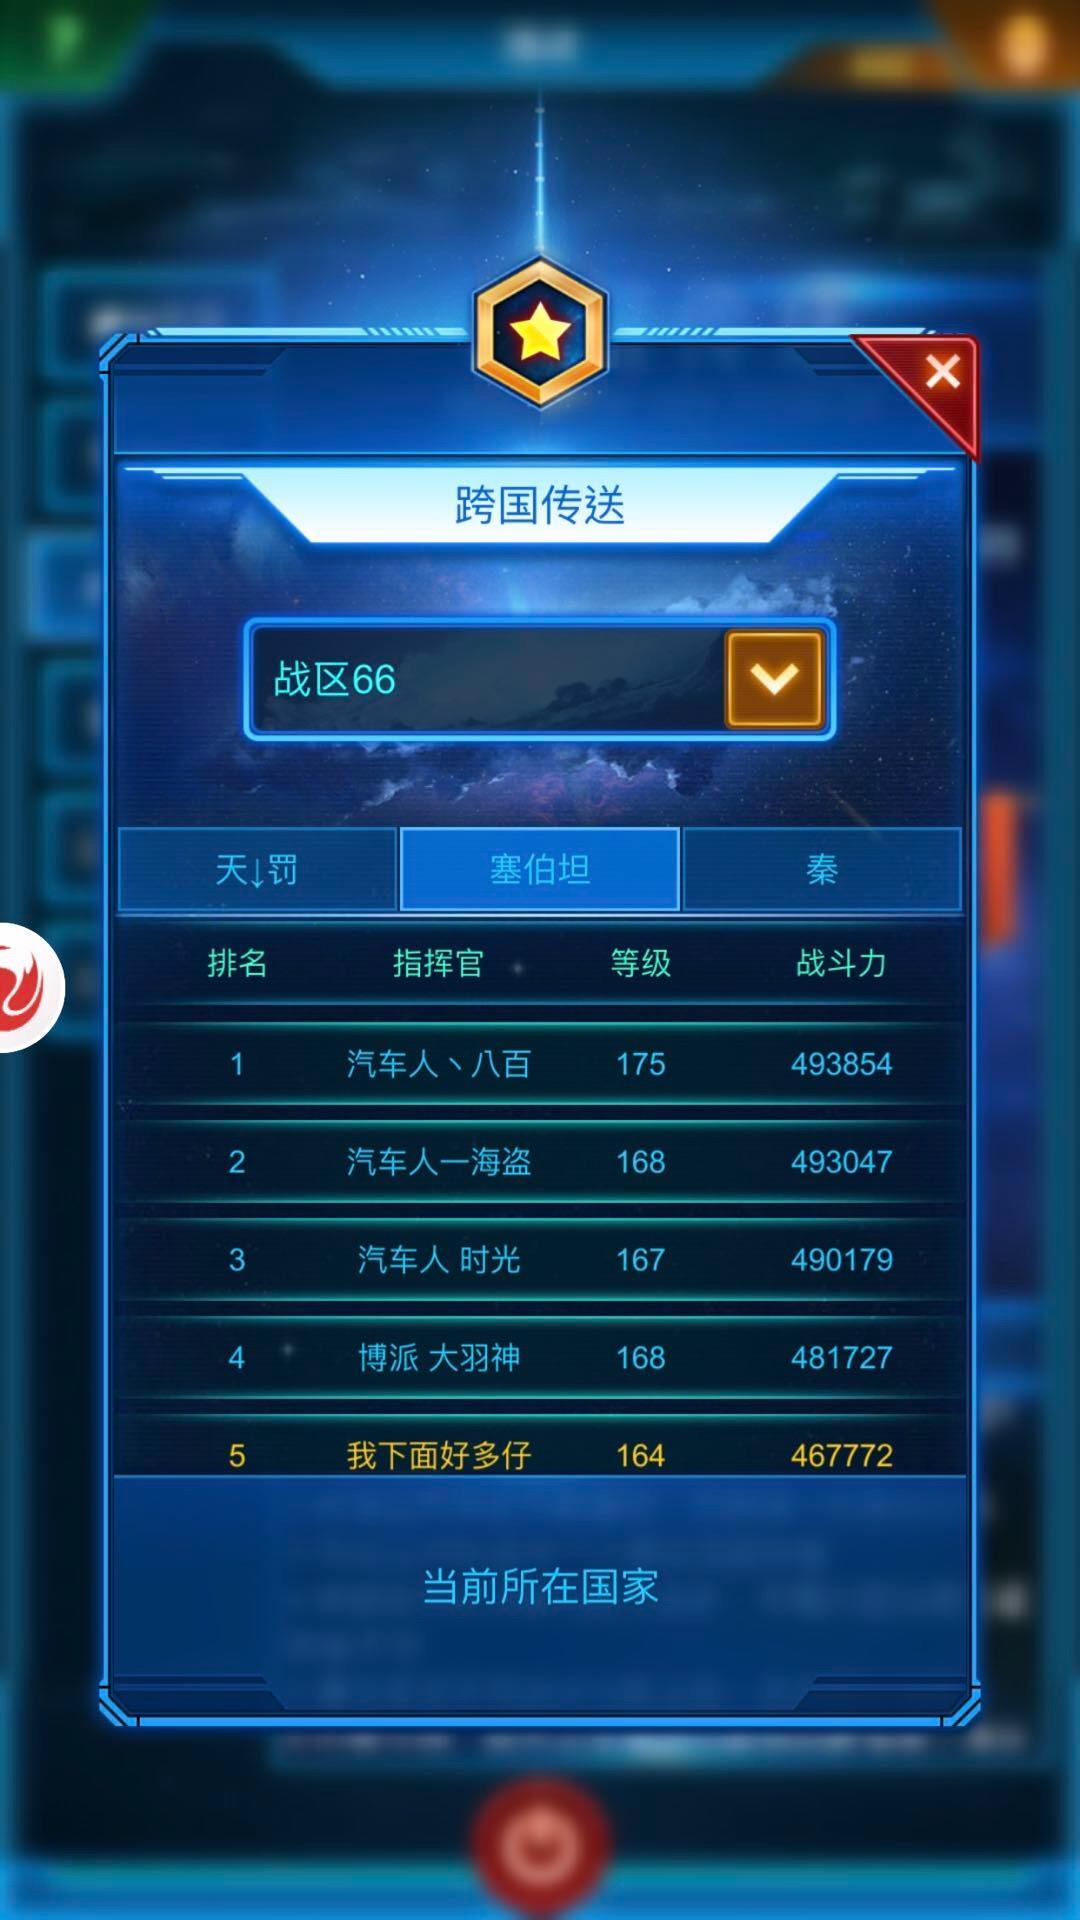 EE528033-59B6-4444-9BE1-D054BCCCA509.jpeg